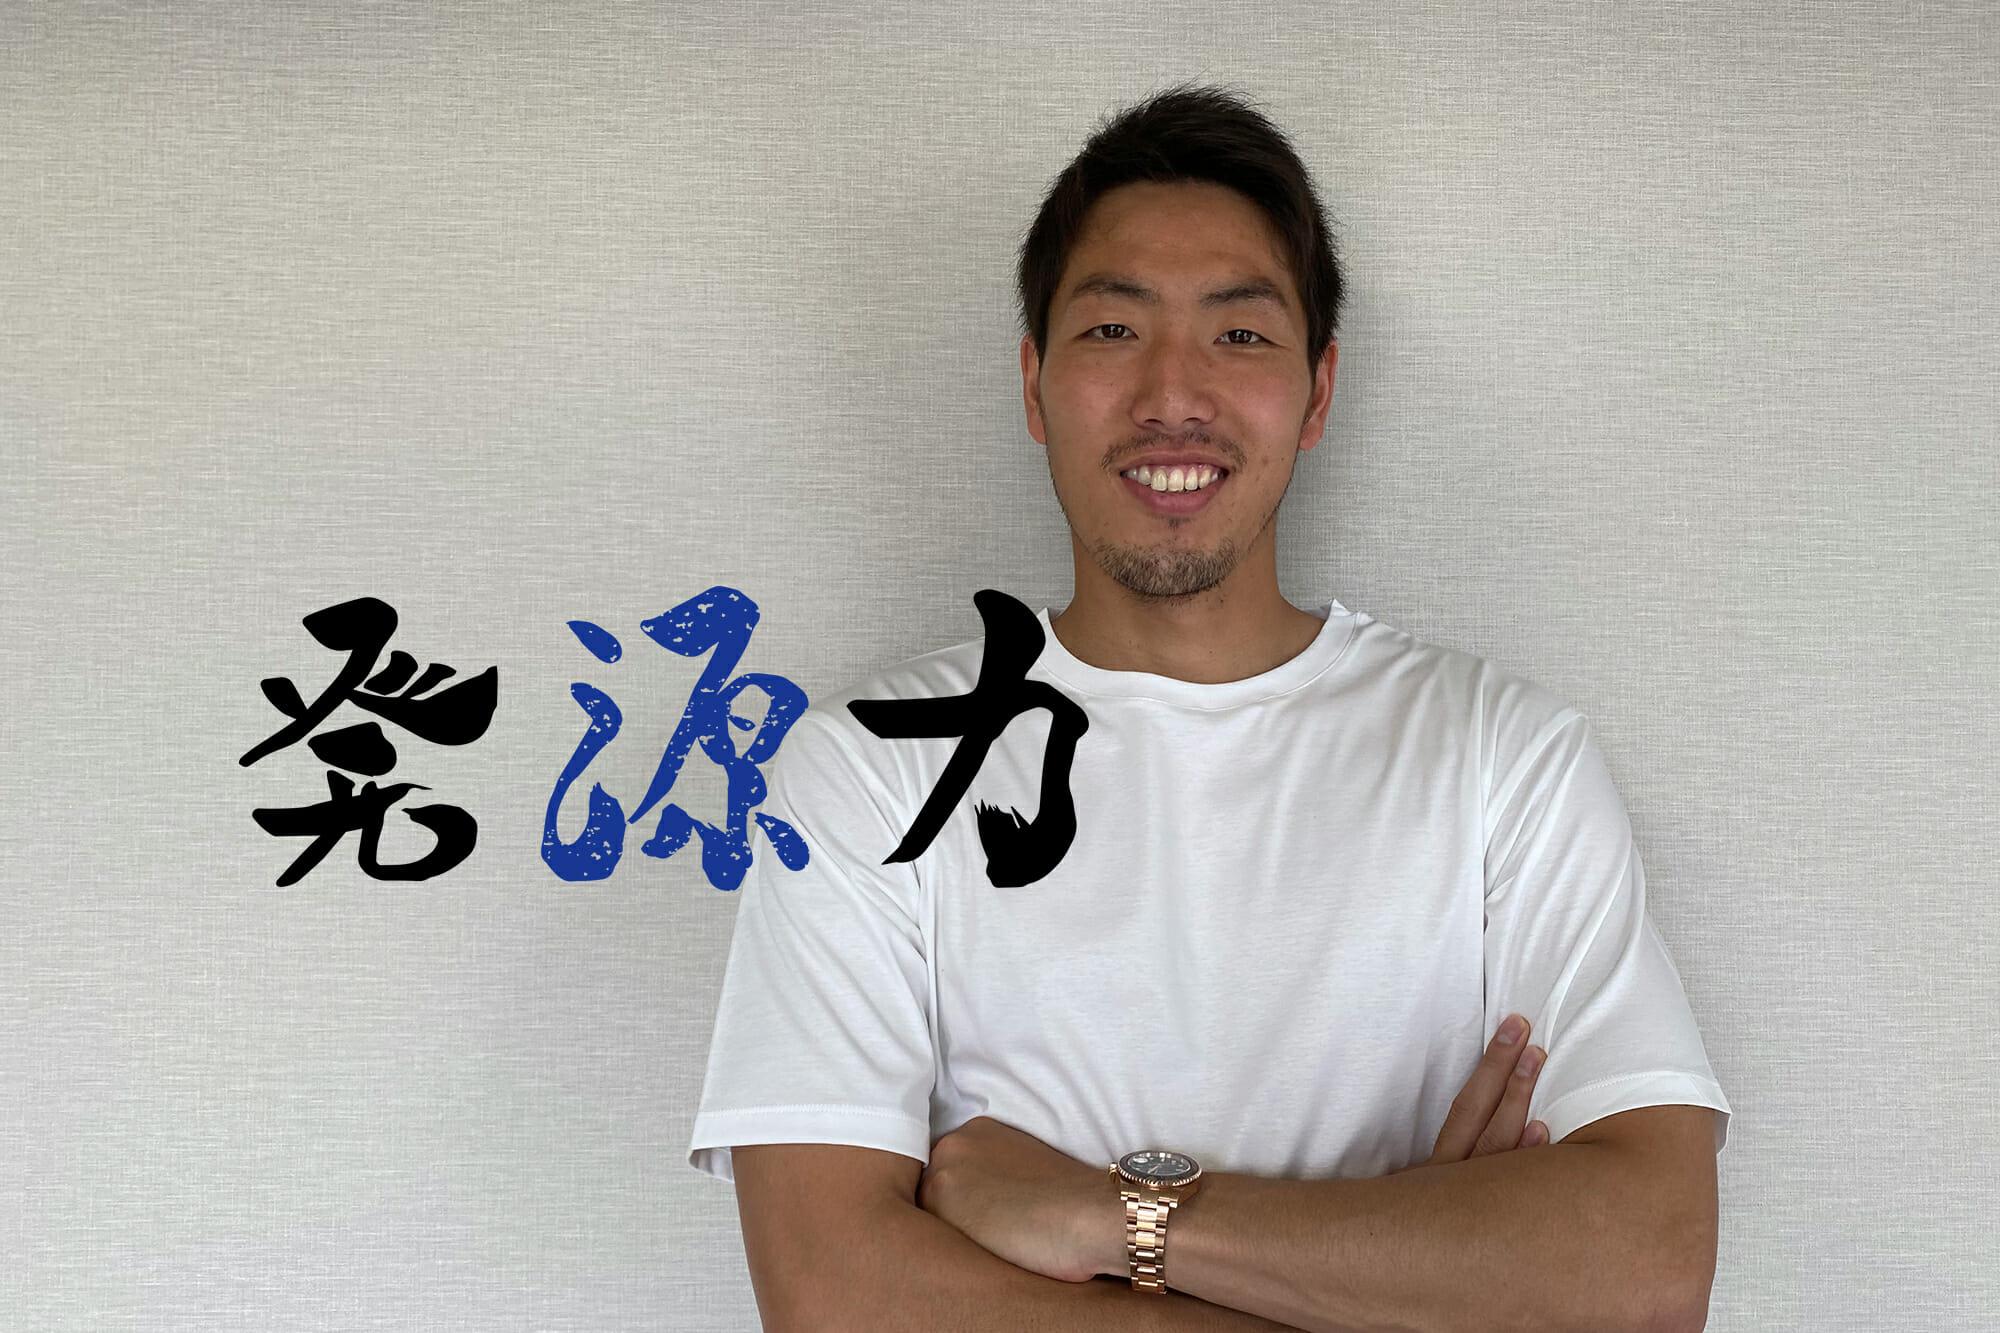 Vol.4 Jリーグ復帰の決断③